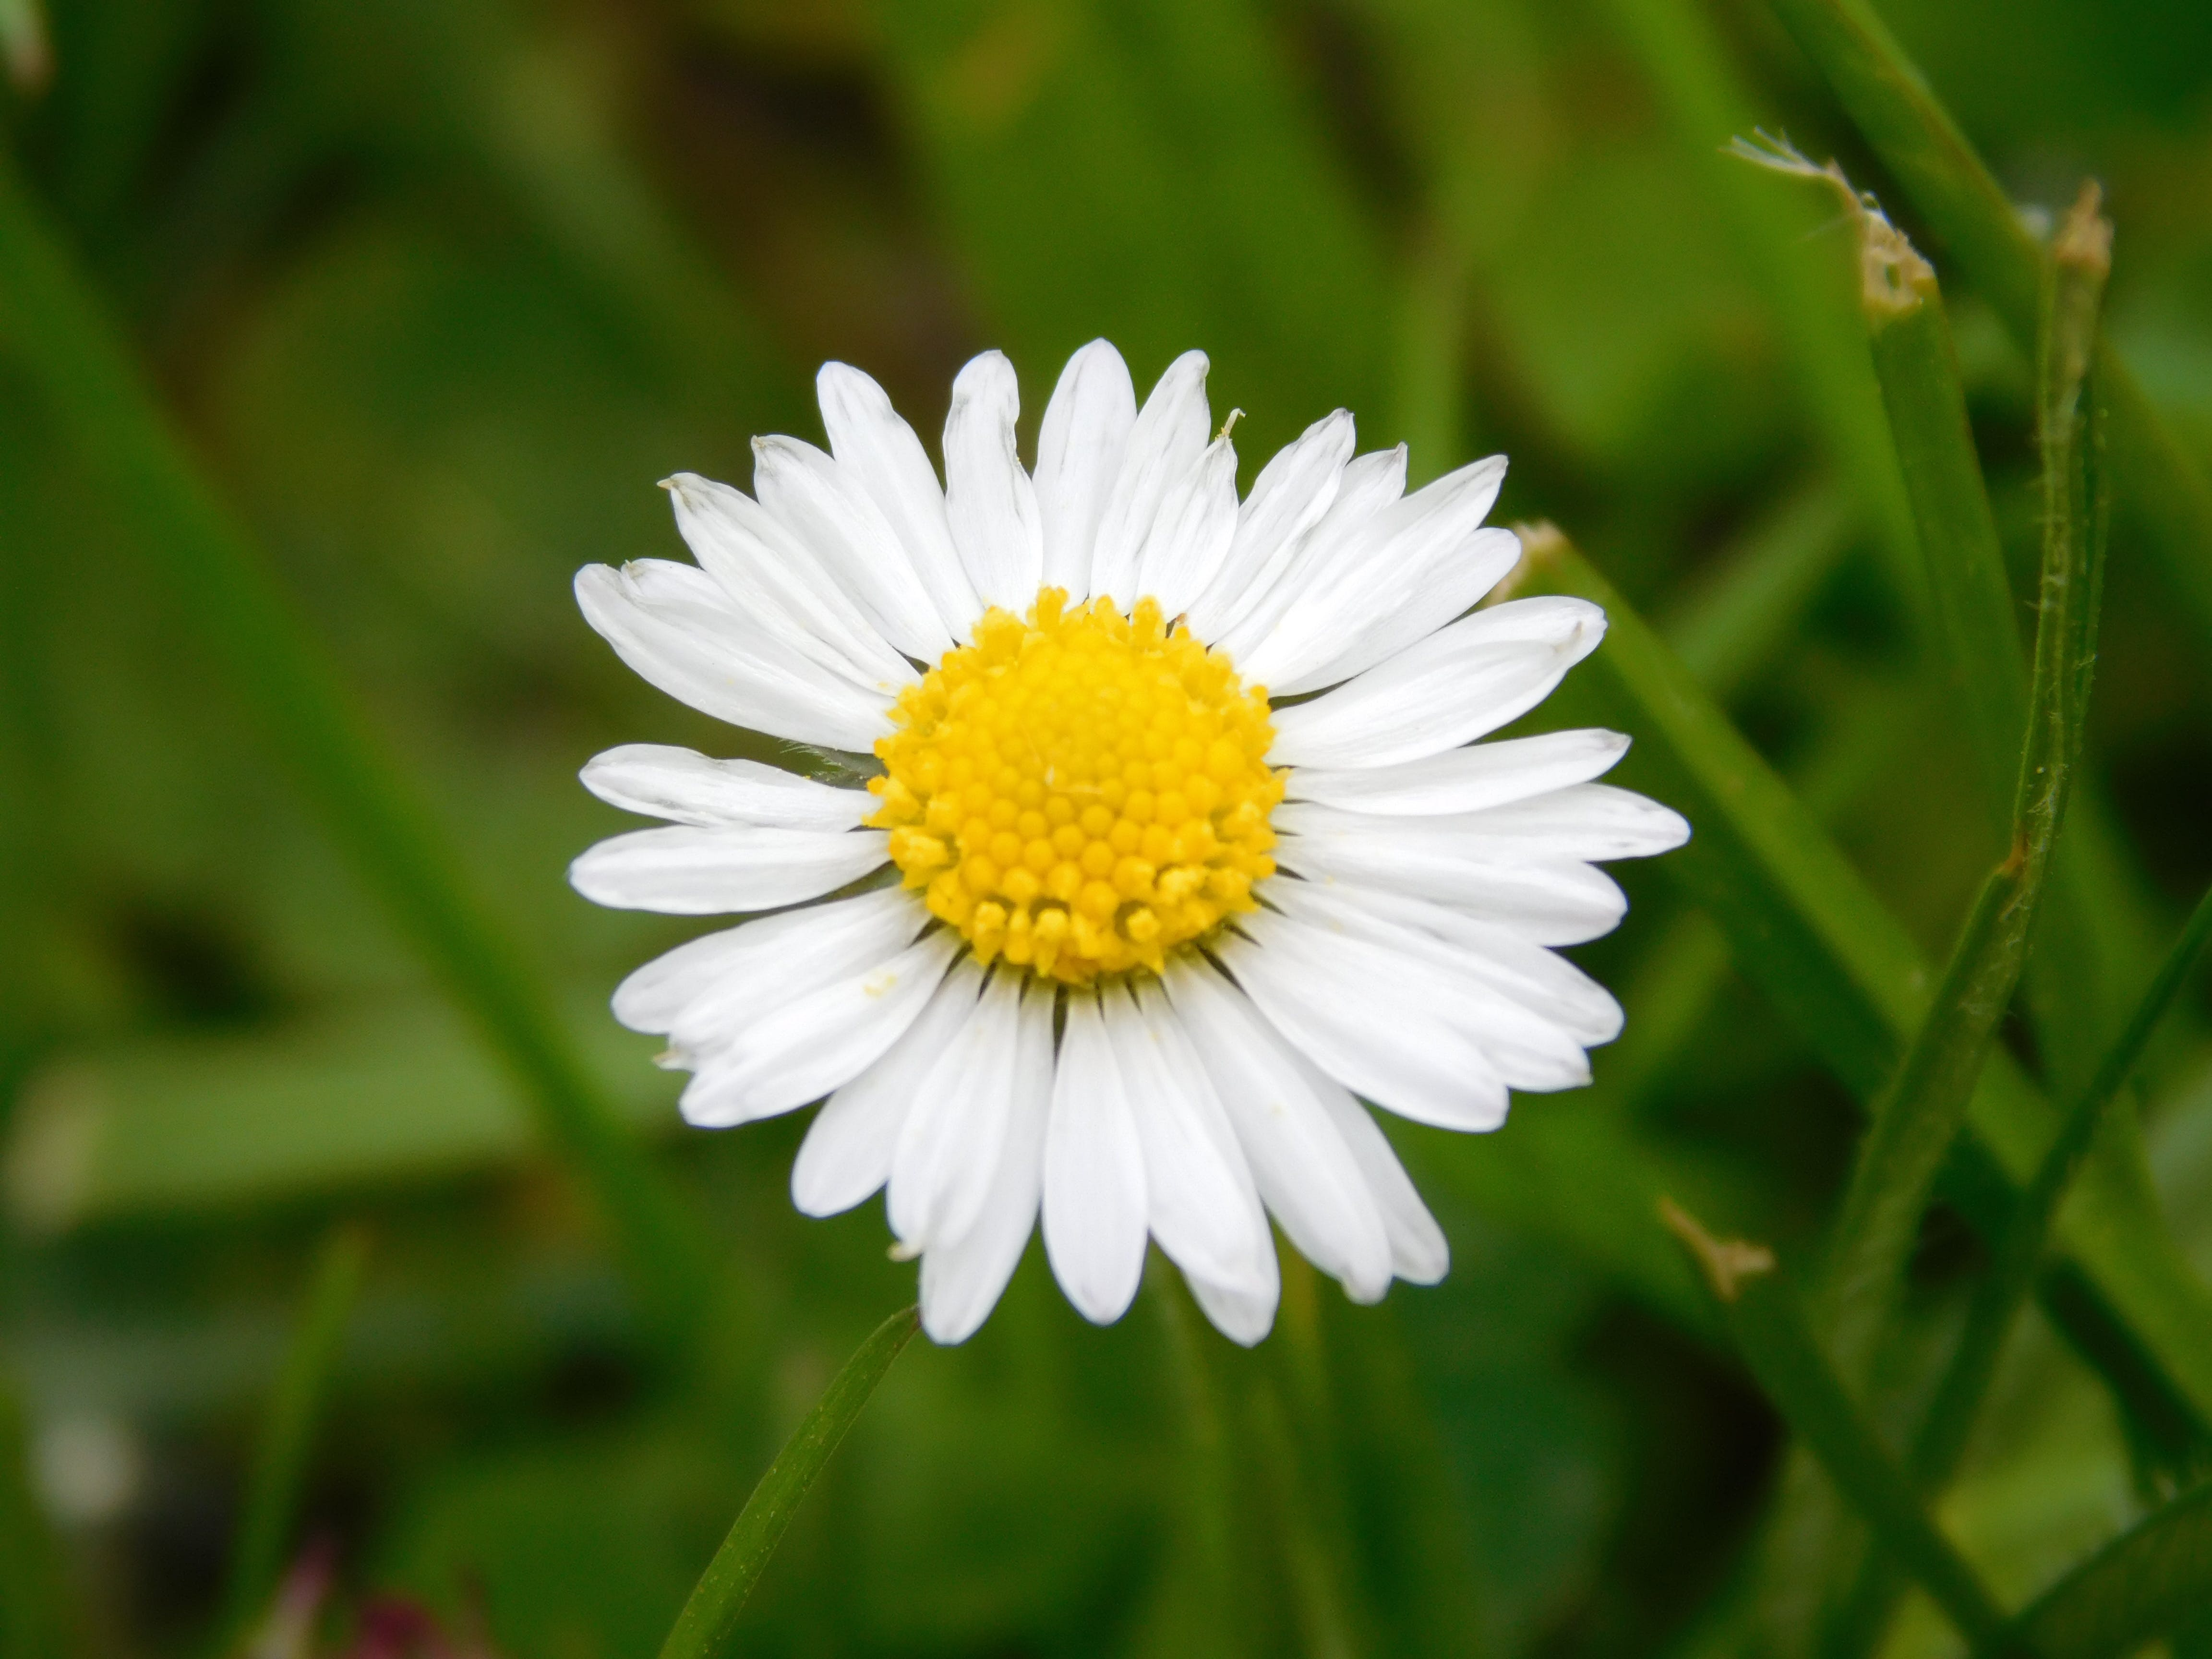 Free stock photo of flower, green, summer, white